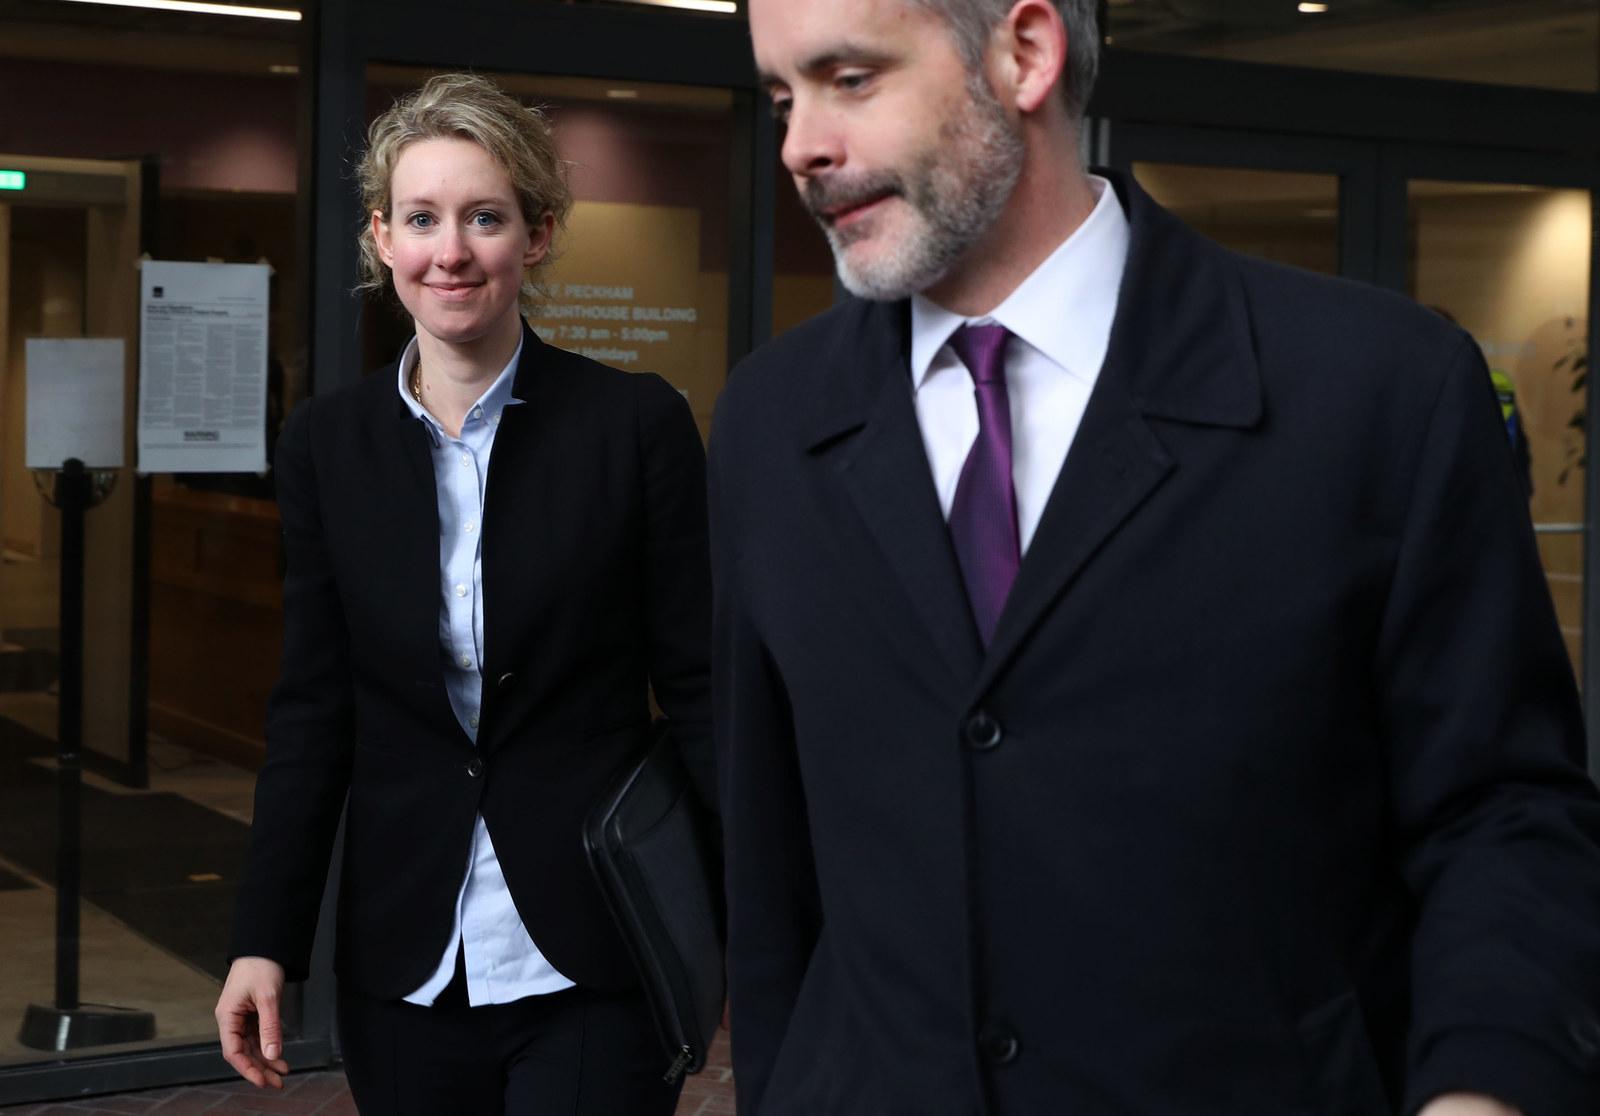 Elizabeth Holmes leaving the Robert F. Peckham U.S. Federal Court in San Jose, CA on January 14, 2019